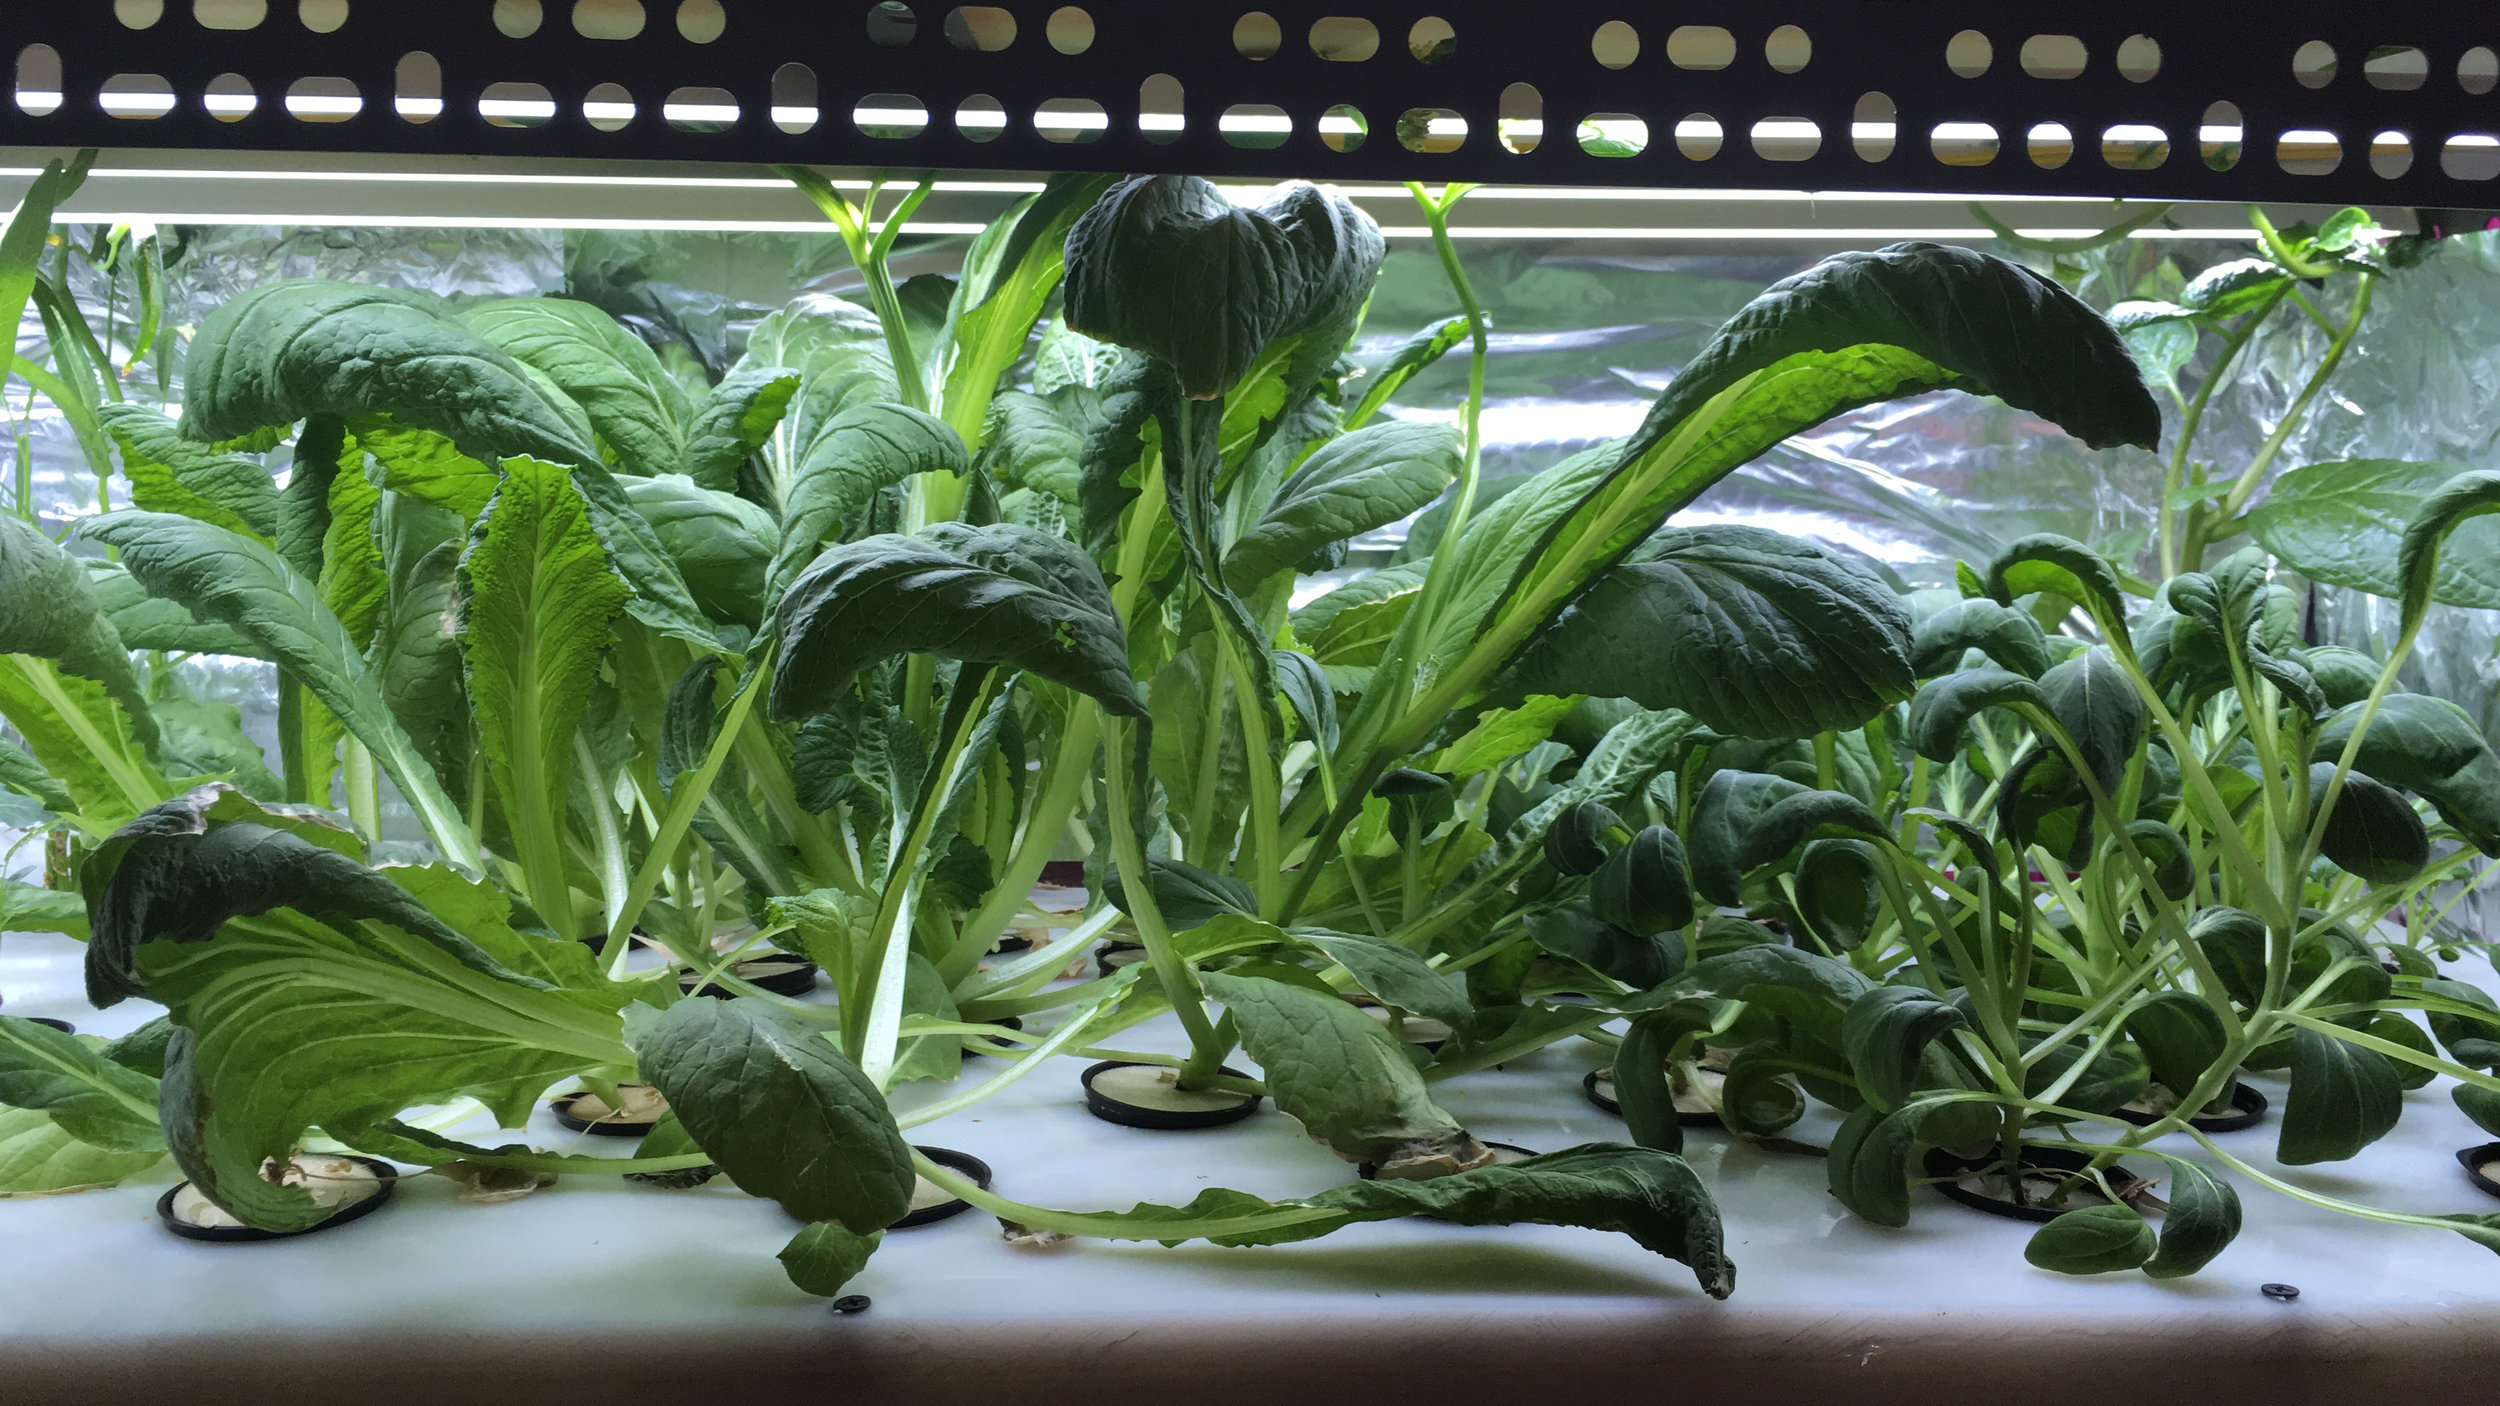 Growing plants (shoot in working prototype)